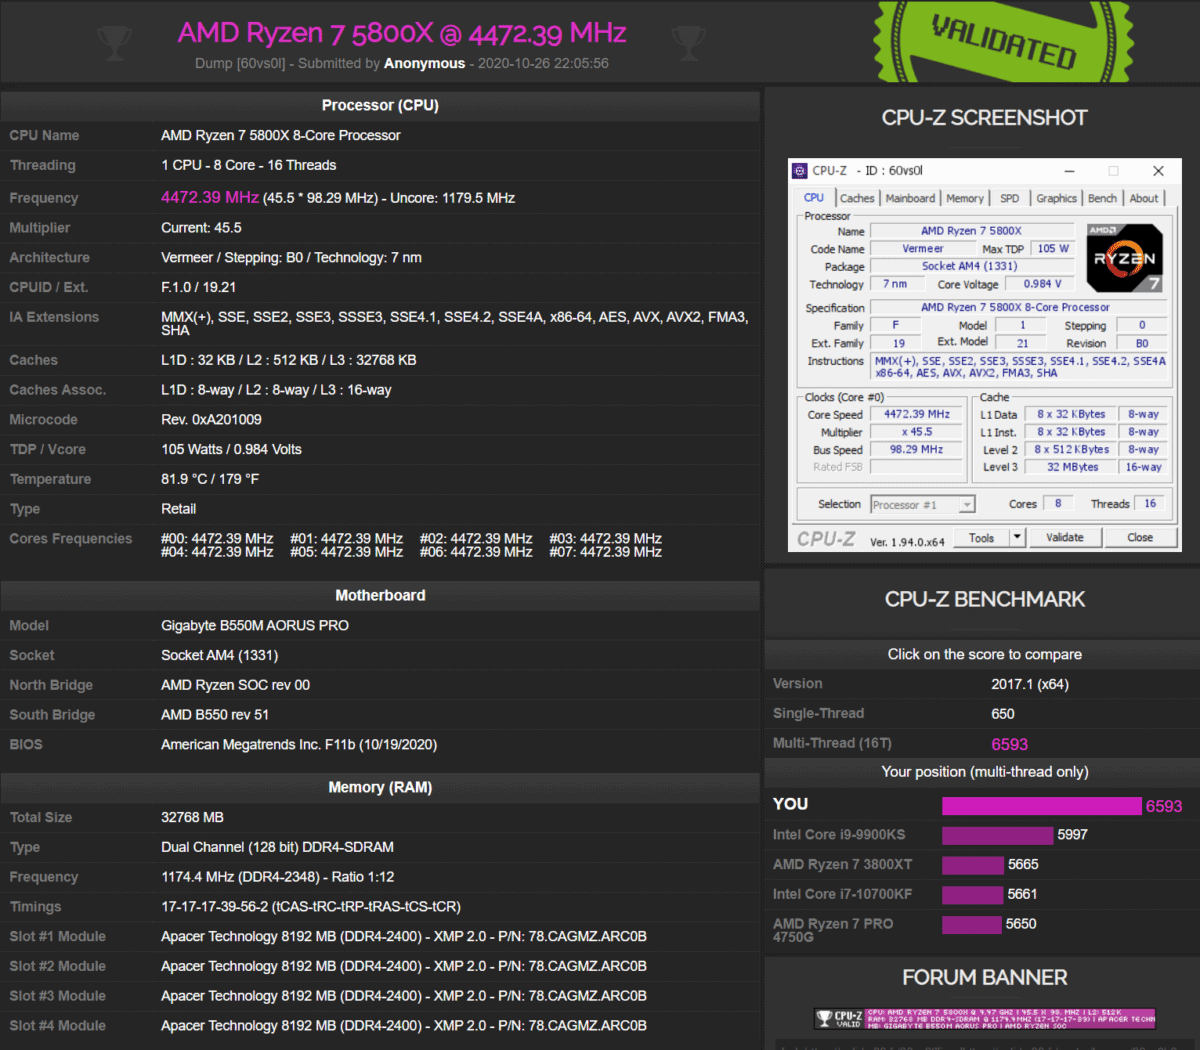 AMD Ryzen 7 5800X 8 Core Desktop CPU Multi Thread Benchmark Performance Leak CPU Z 2